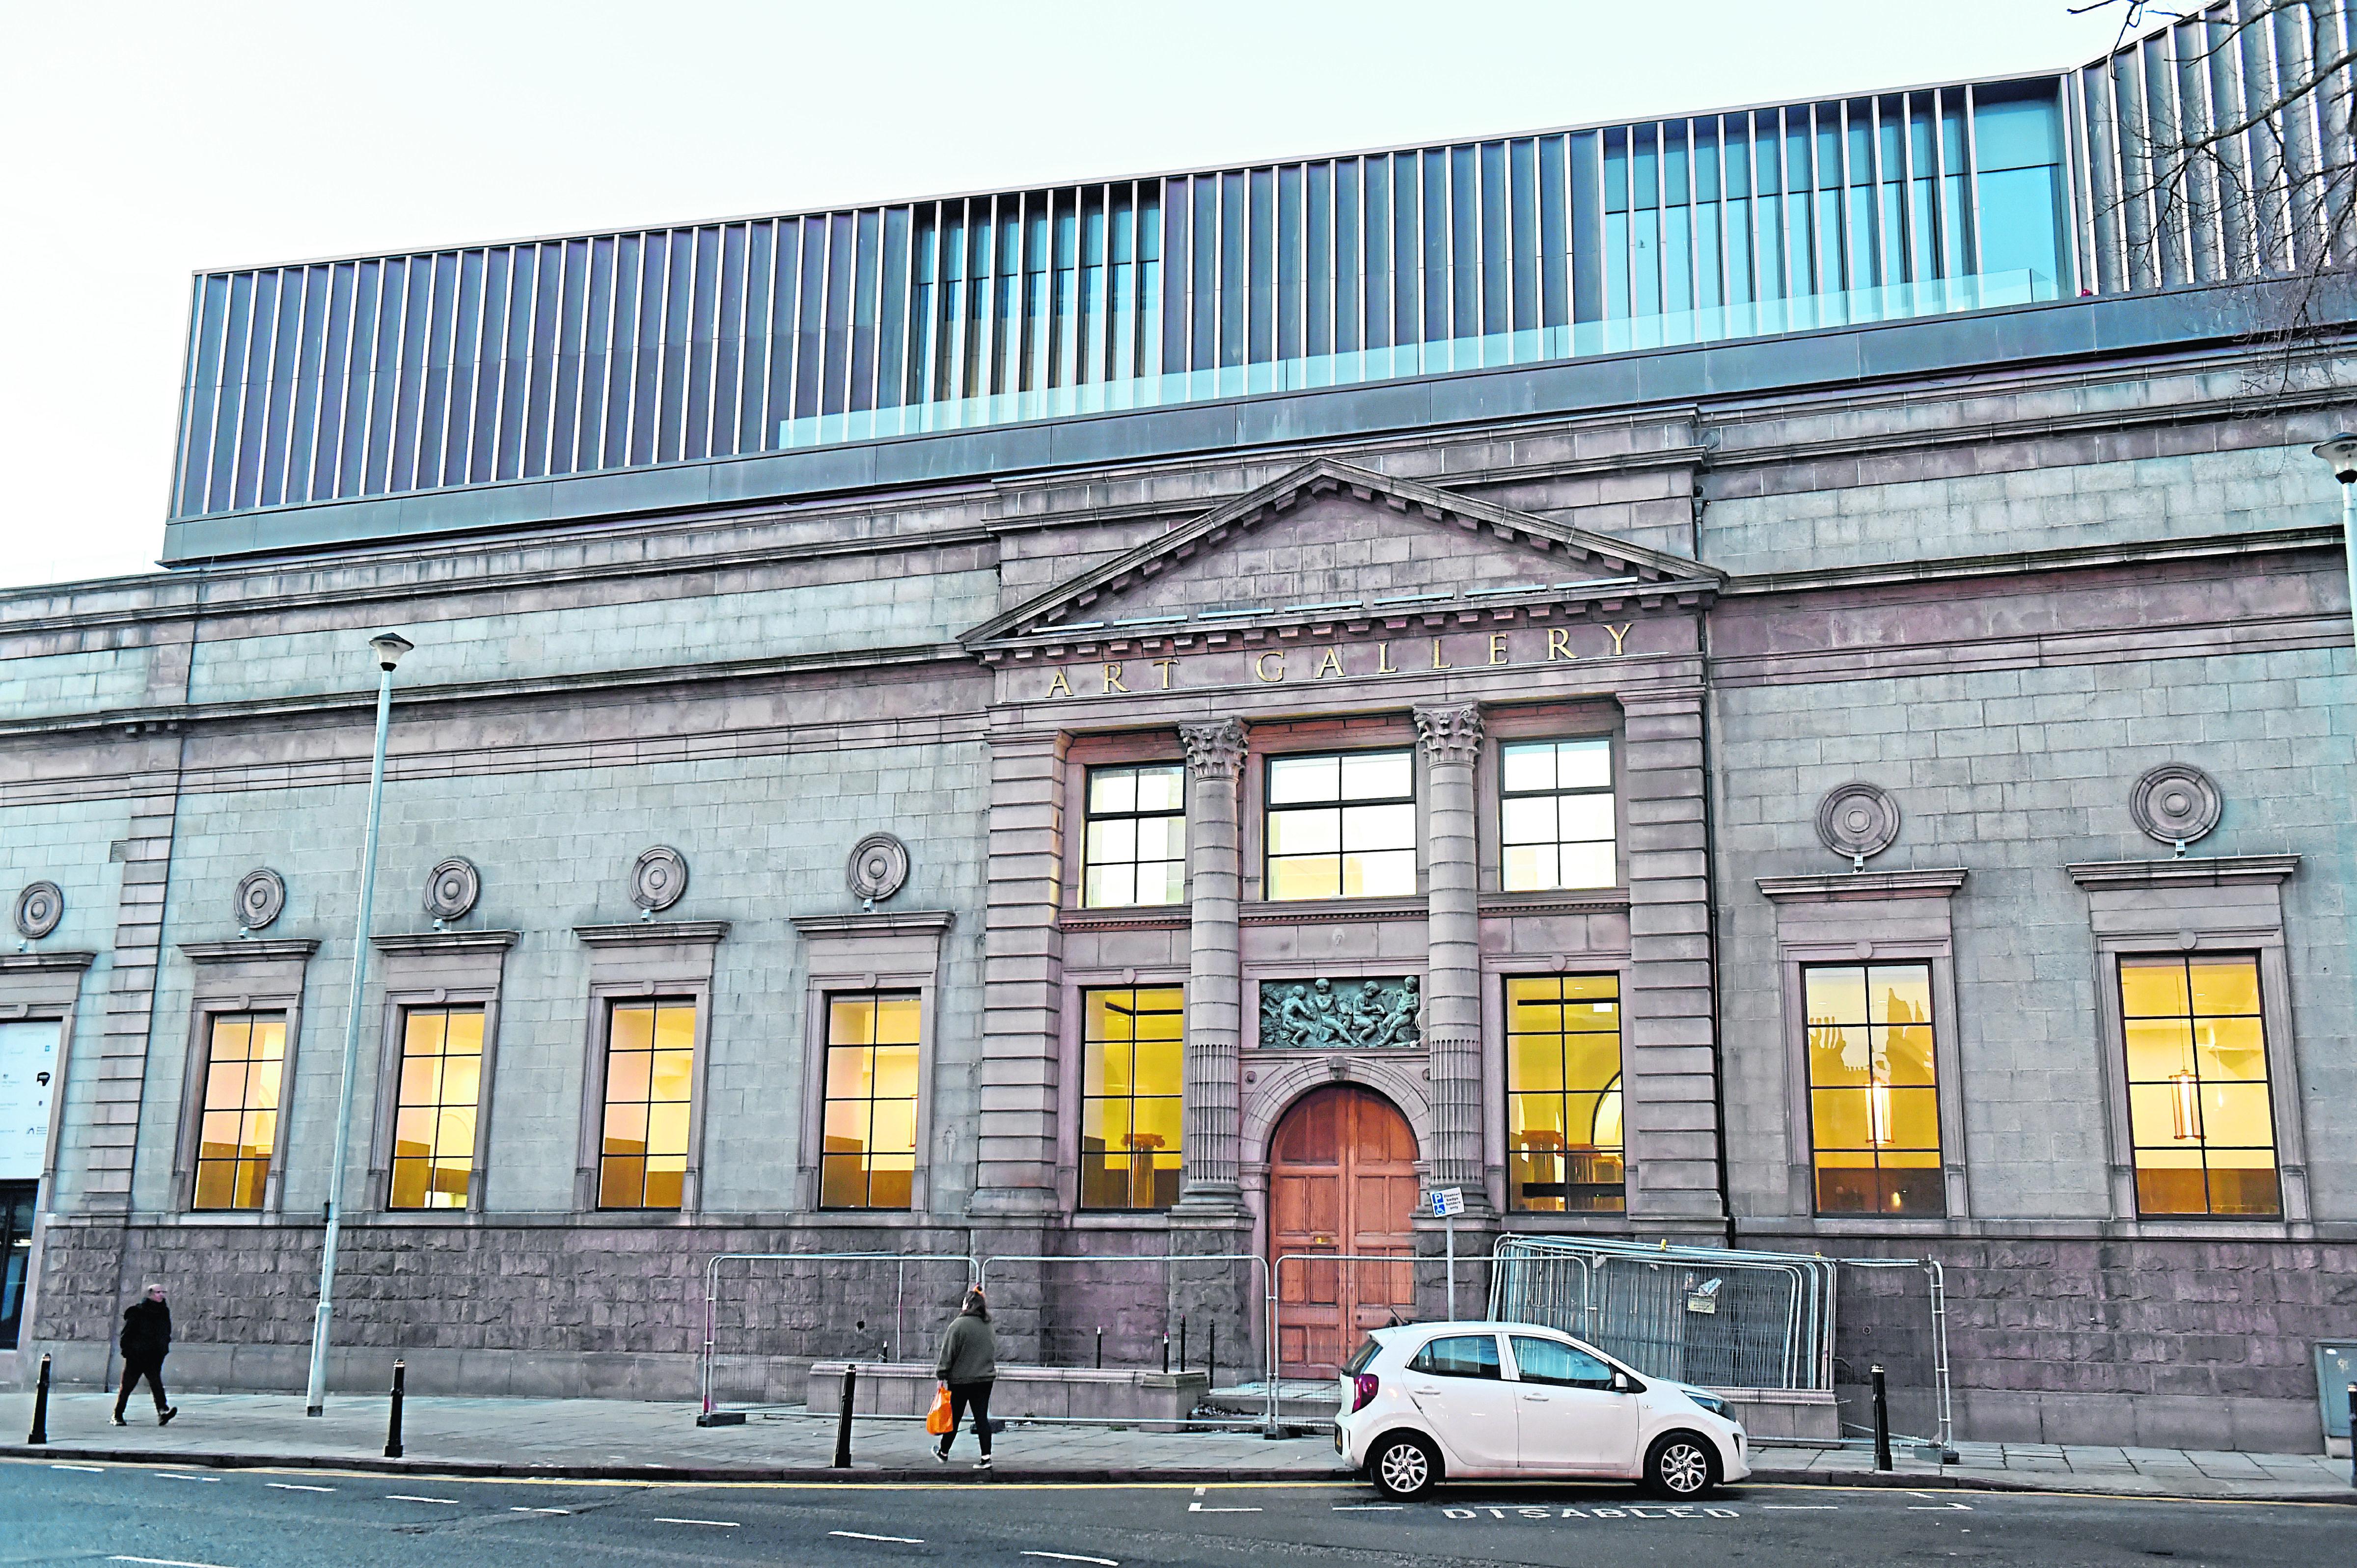 Aberdeen Art Gallery and Museum